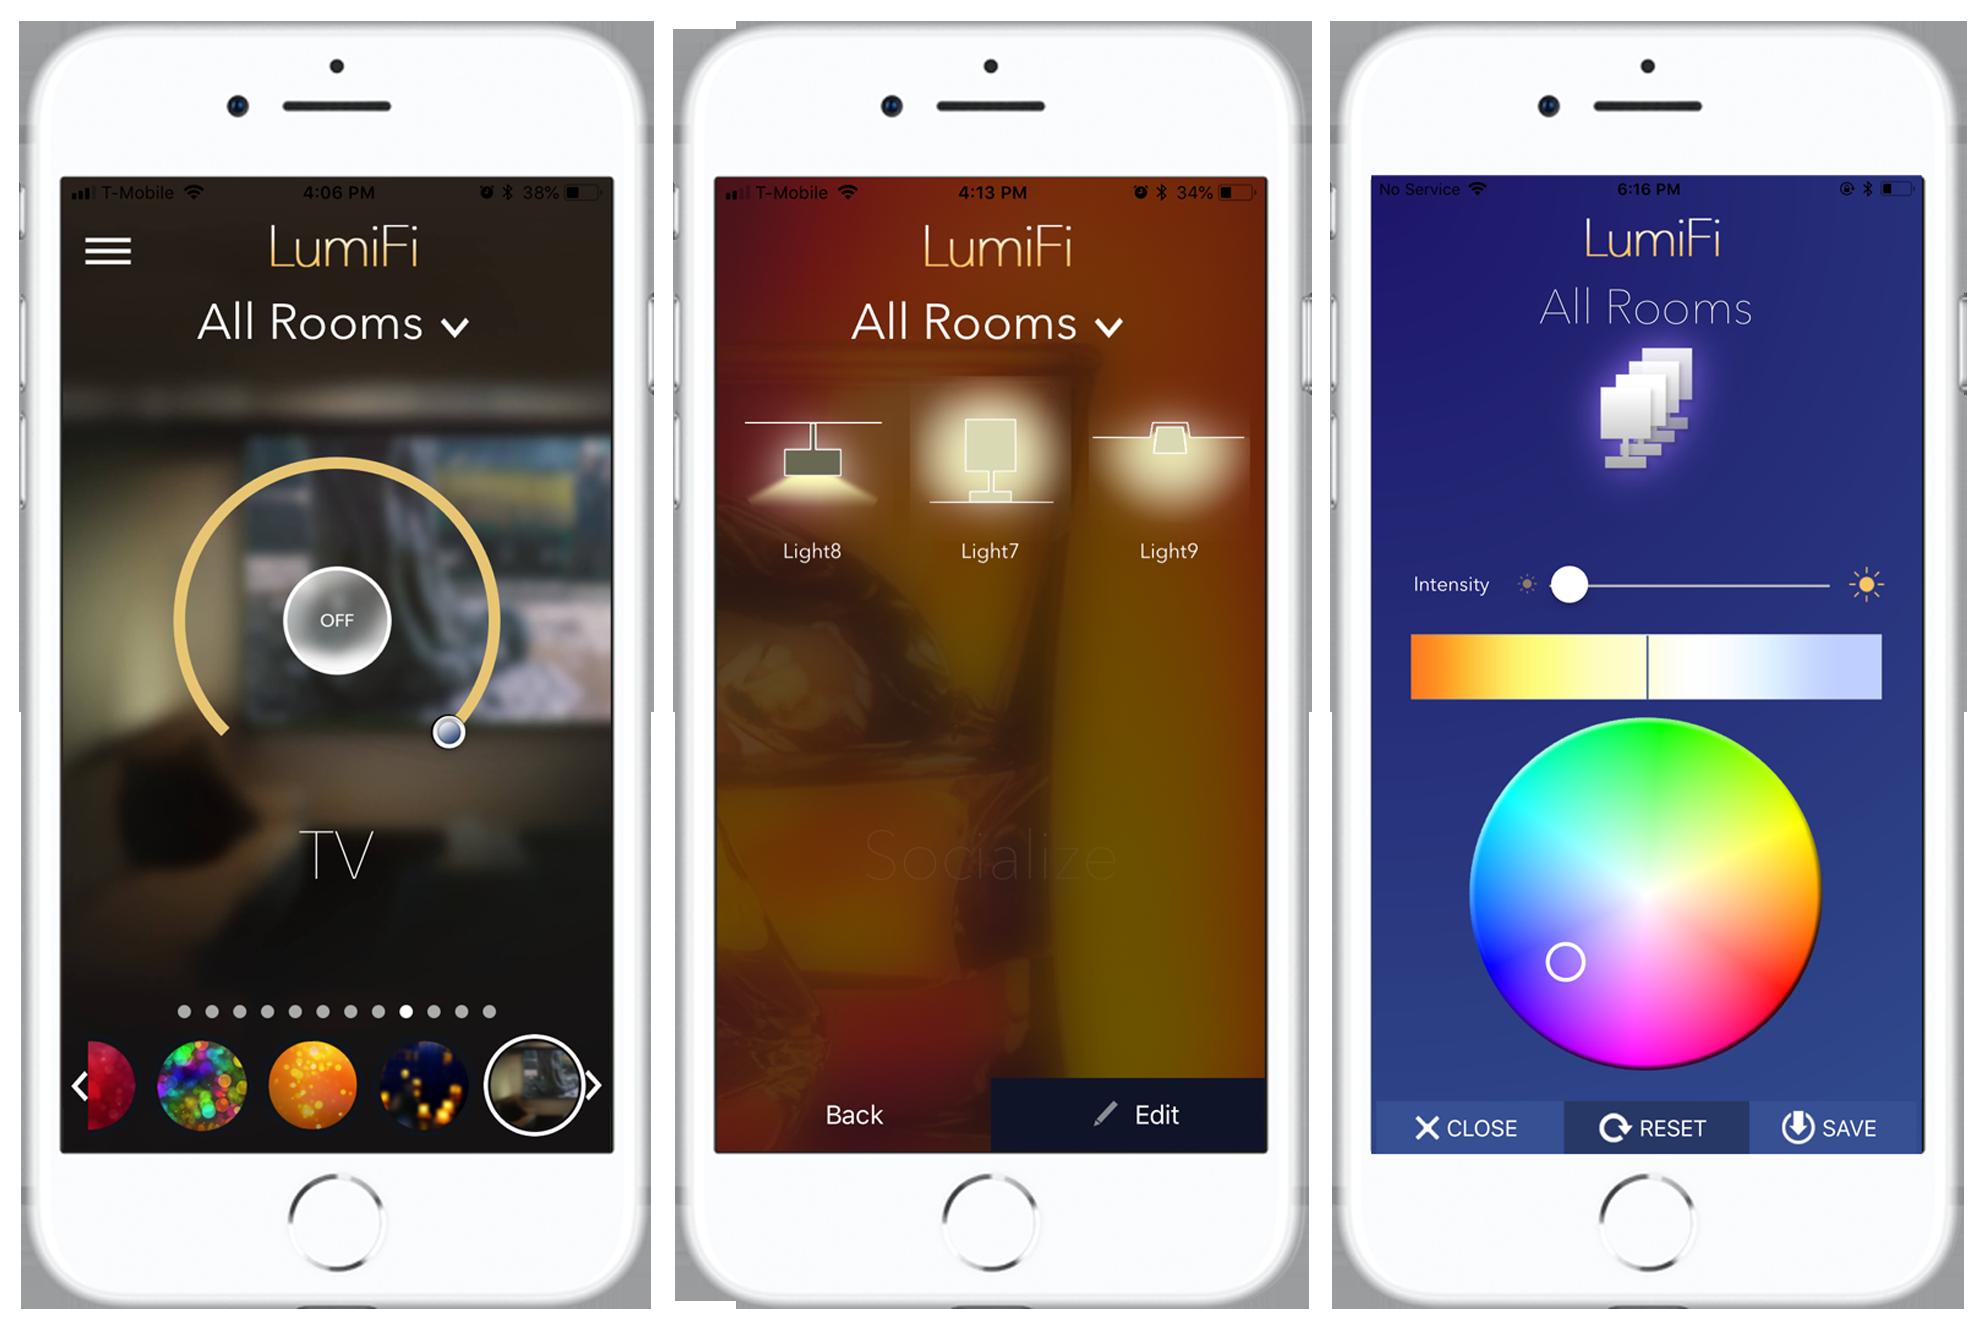 LumiFi-Screen-Collage-2.png